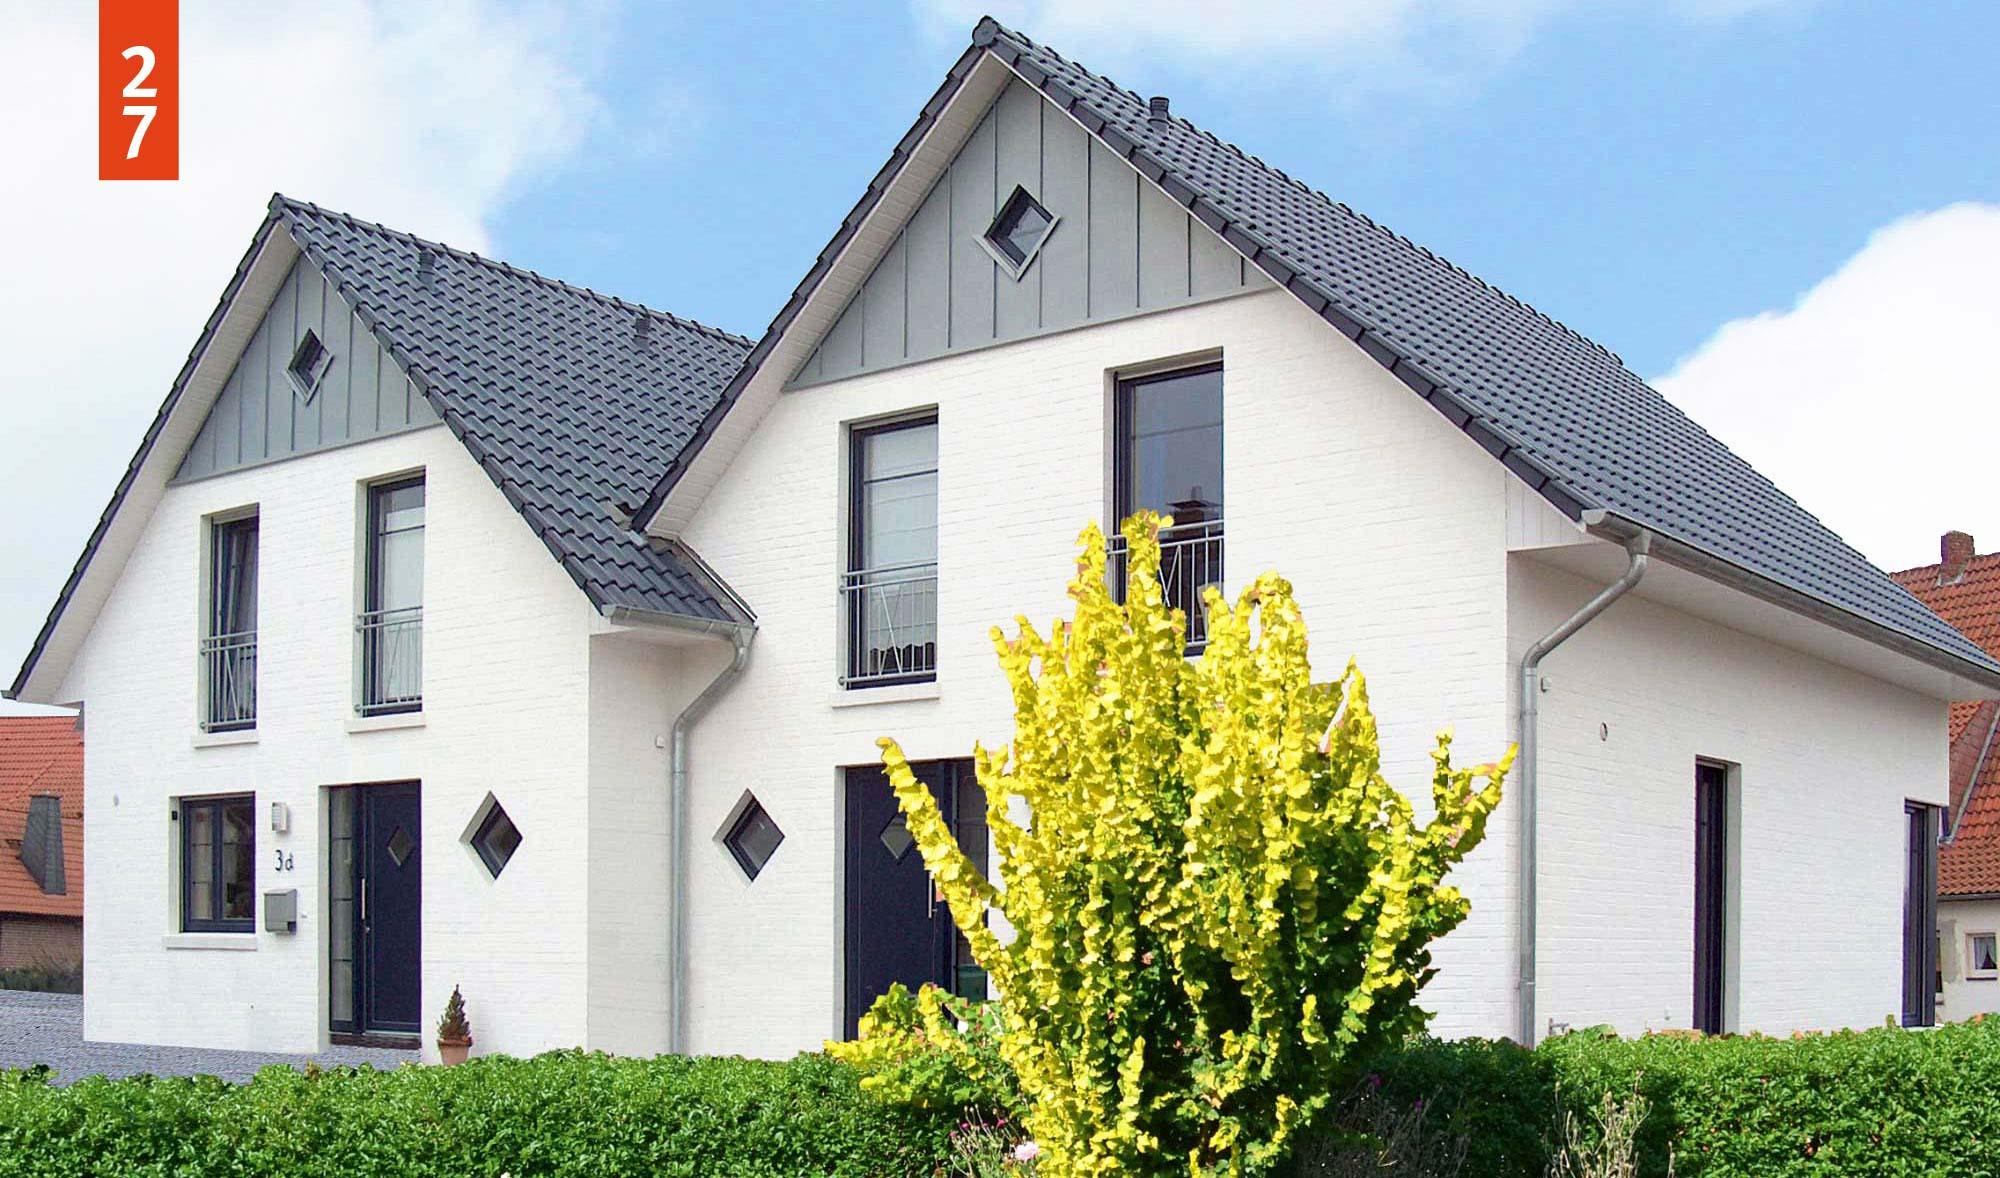 raumwandel doppelhaus 120 120 qm. Black Bedroom Furniture Sets. Home Design Ideas